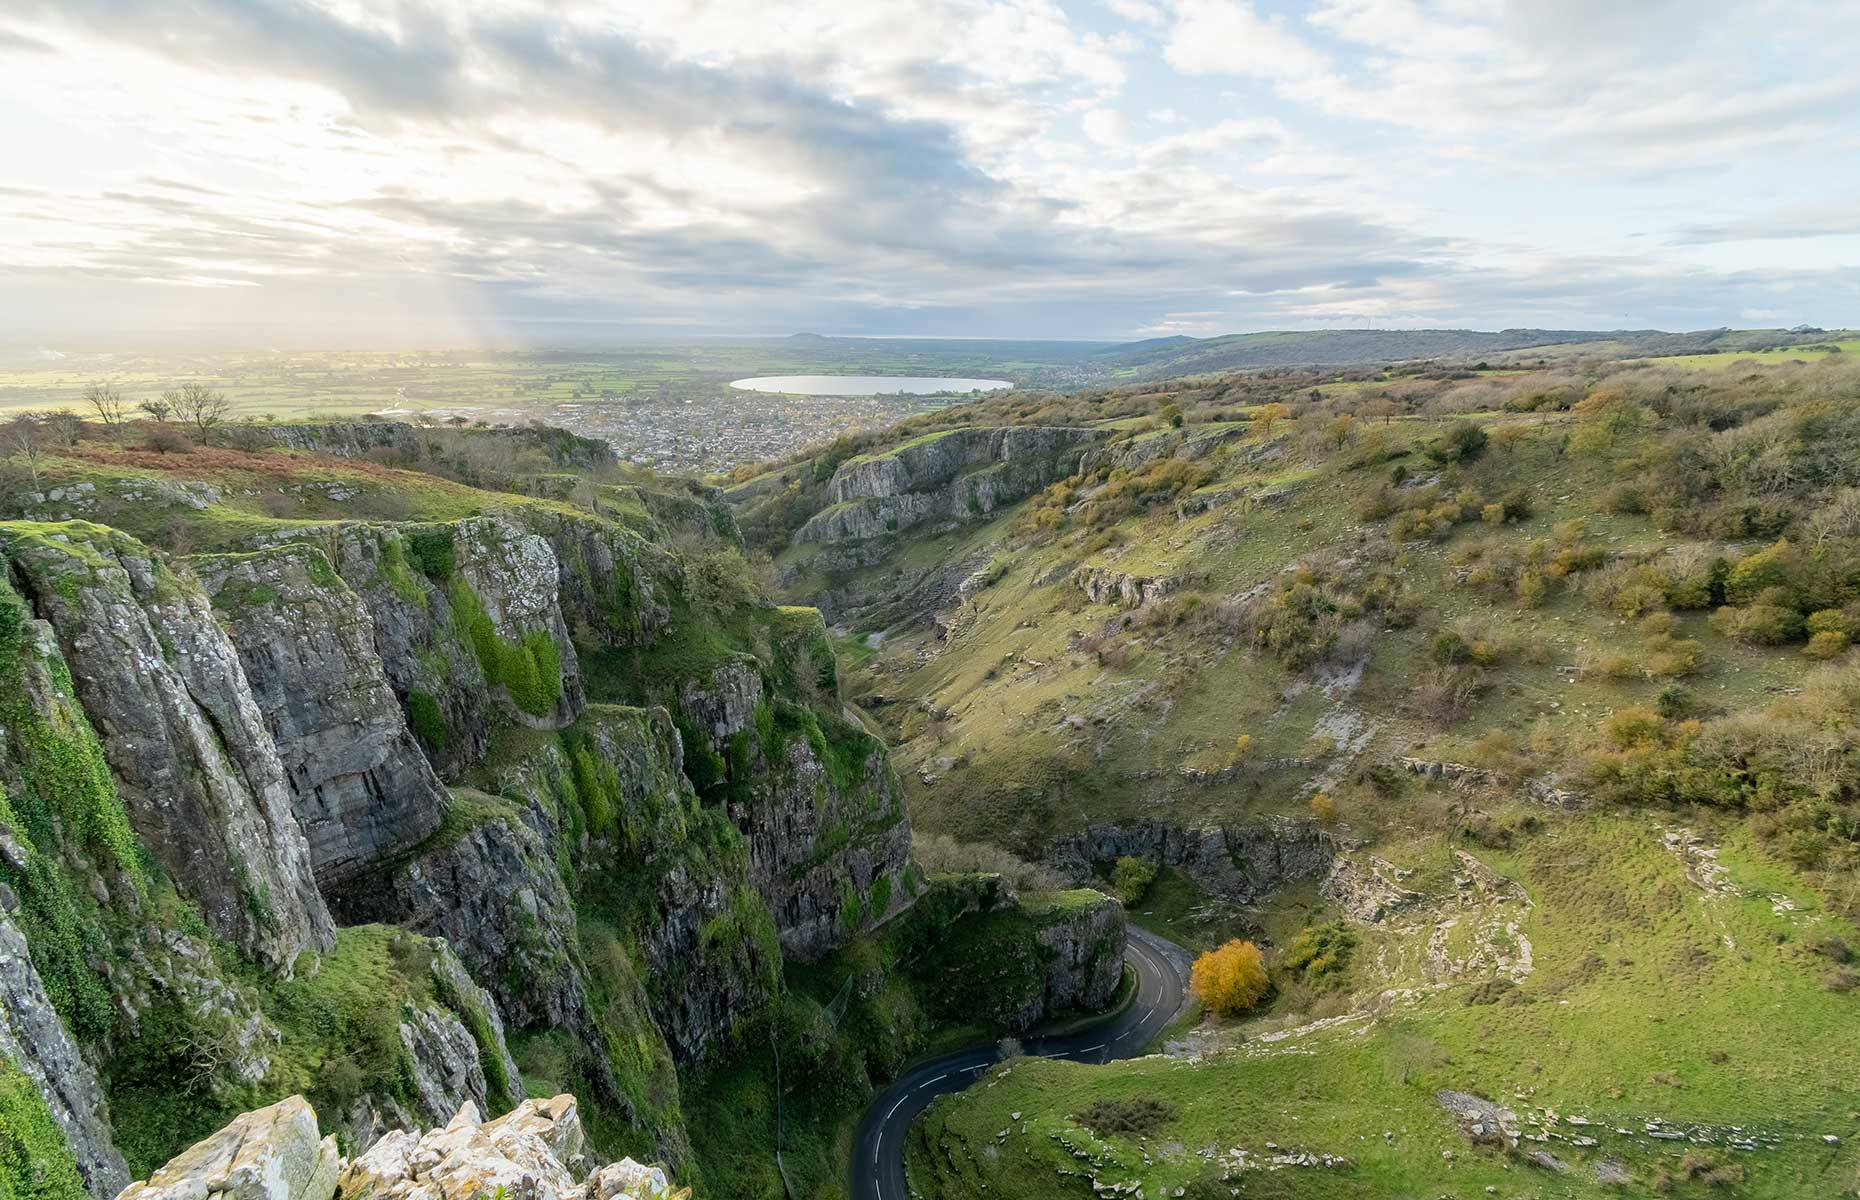 Mendip Hills (Image: Tom Meaker/Shutterstock)